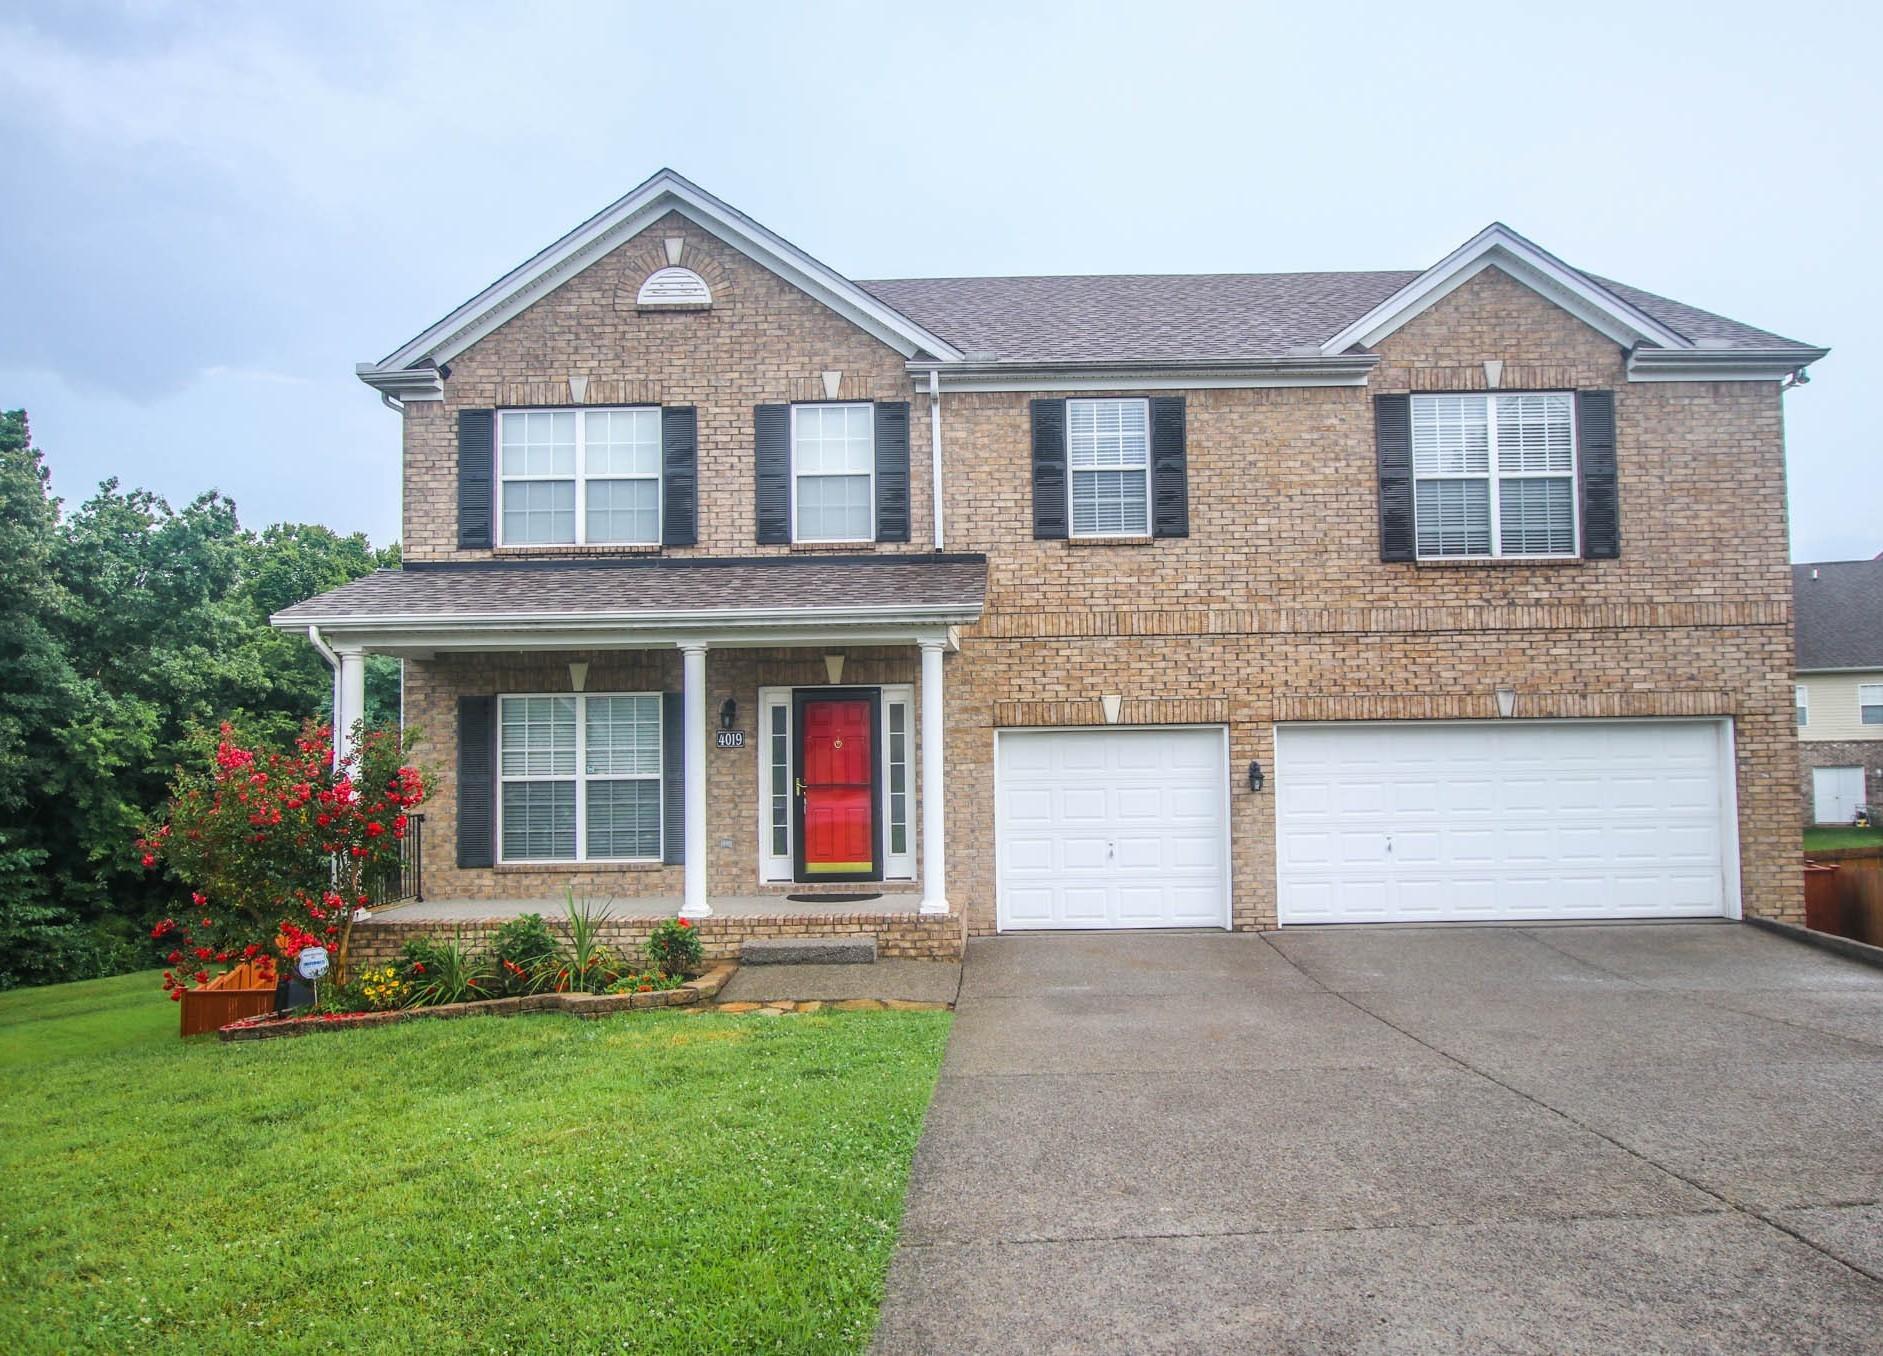 4019 Fairway Cir Property Photo 1